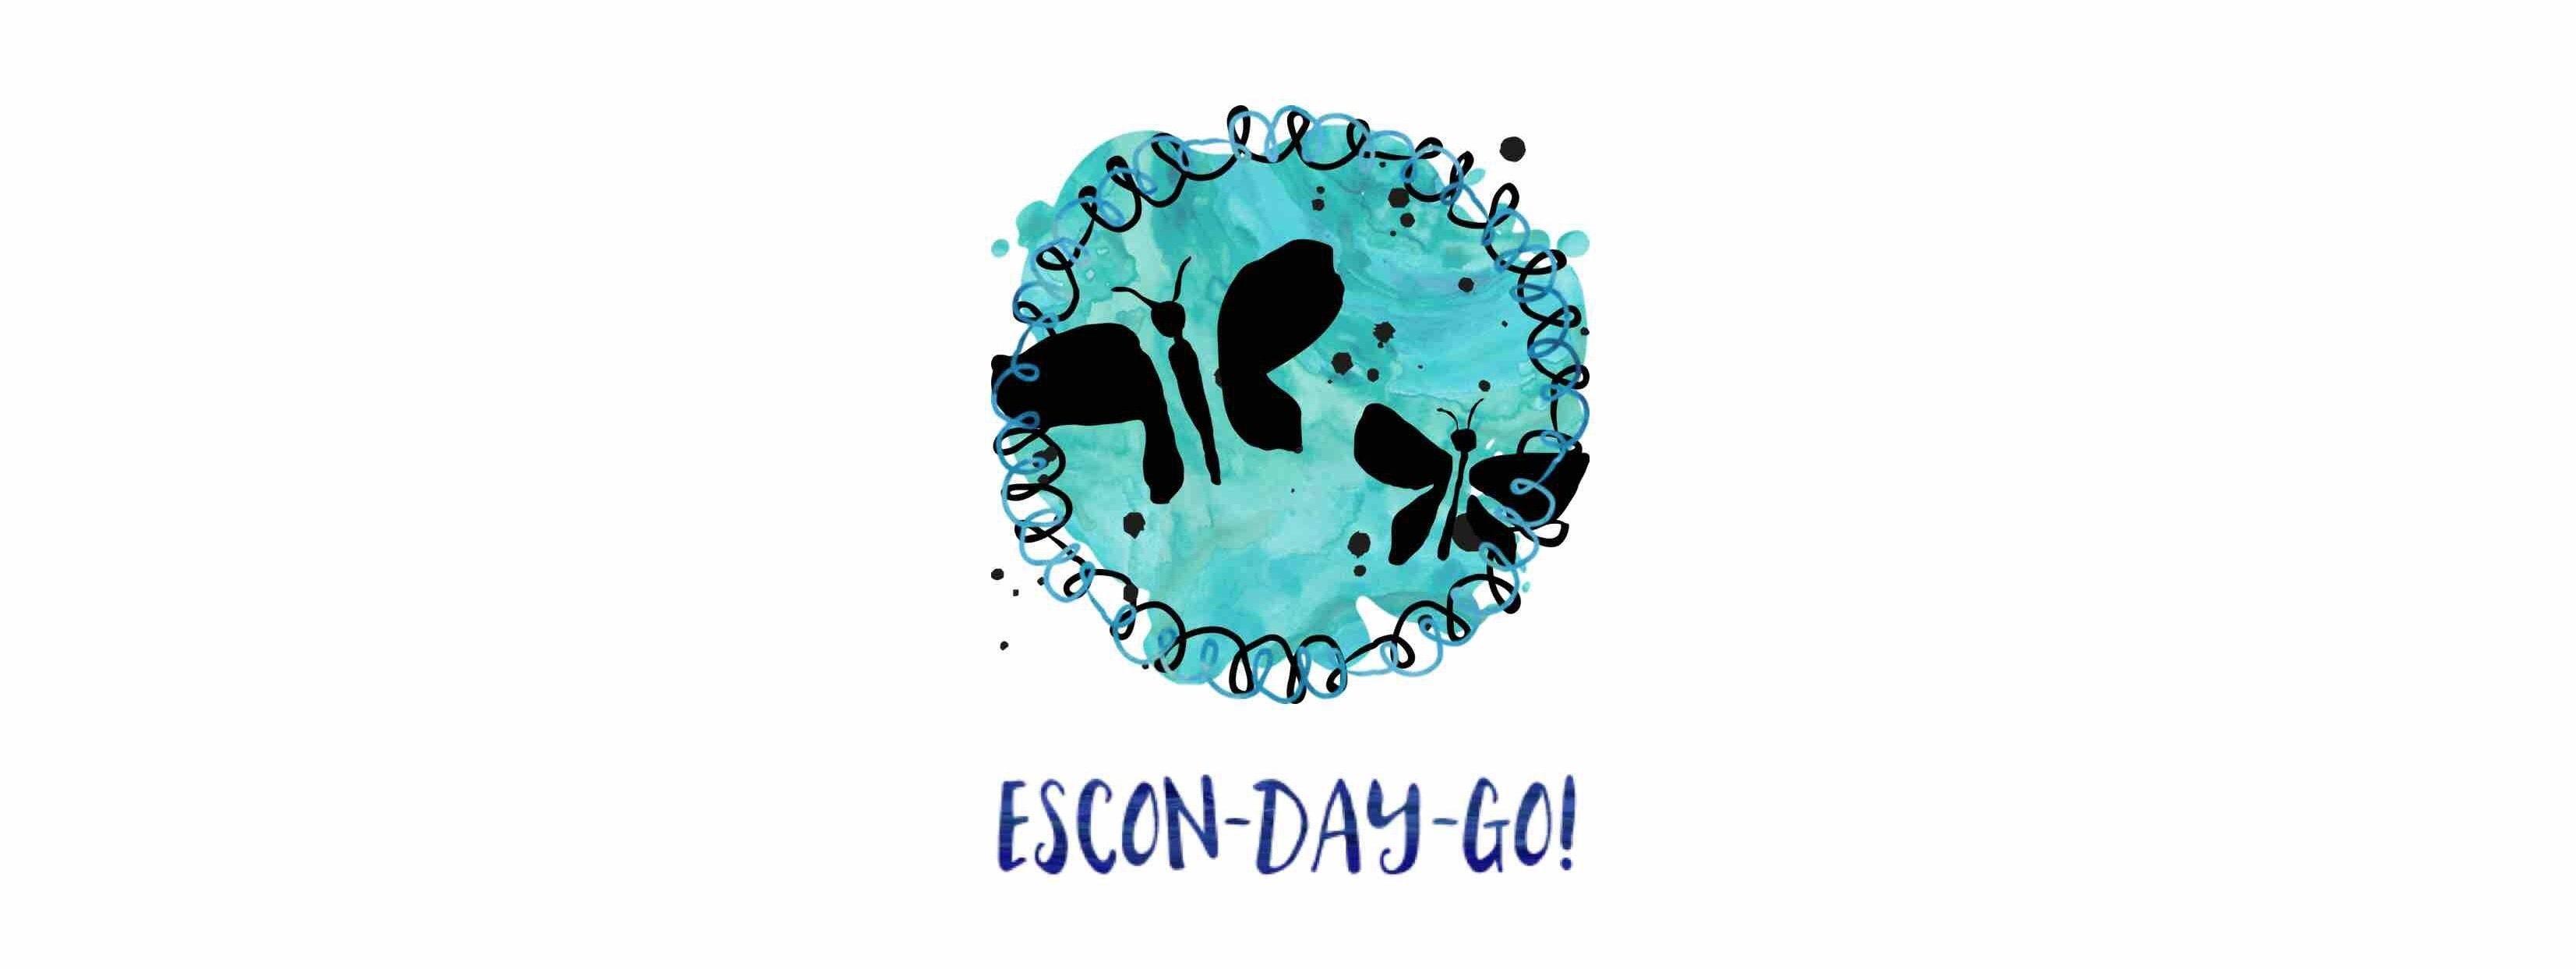 (Escon-day-go) Escondido Playdates!